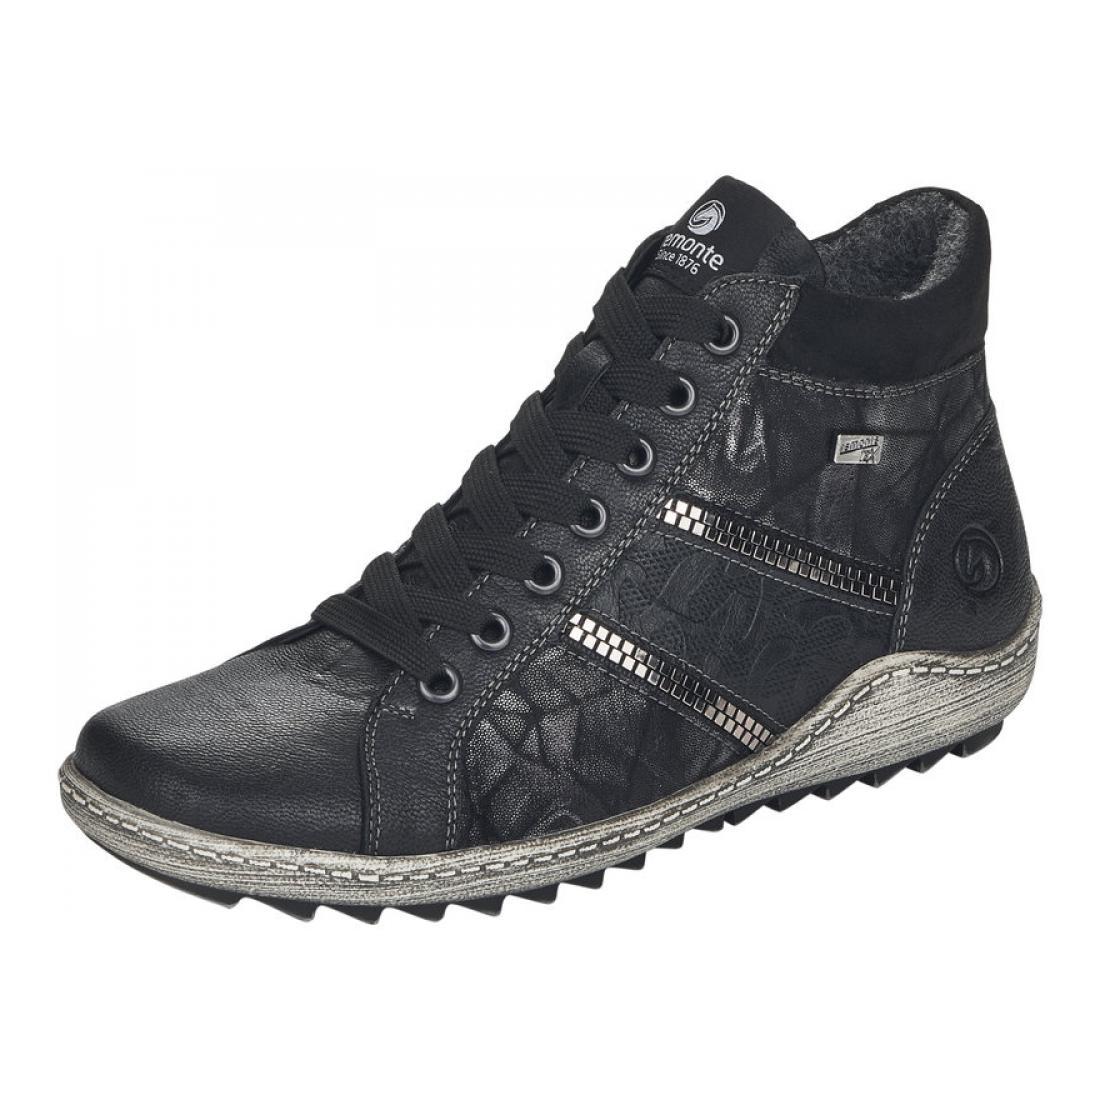 Remonte Sneaker high